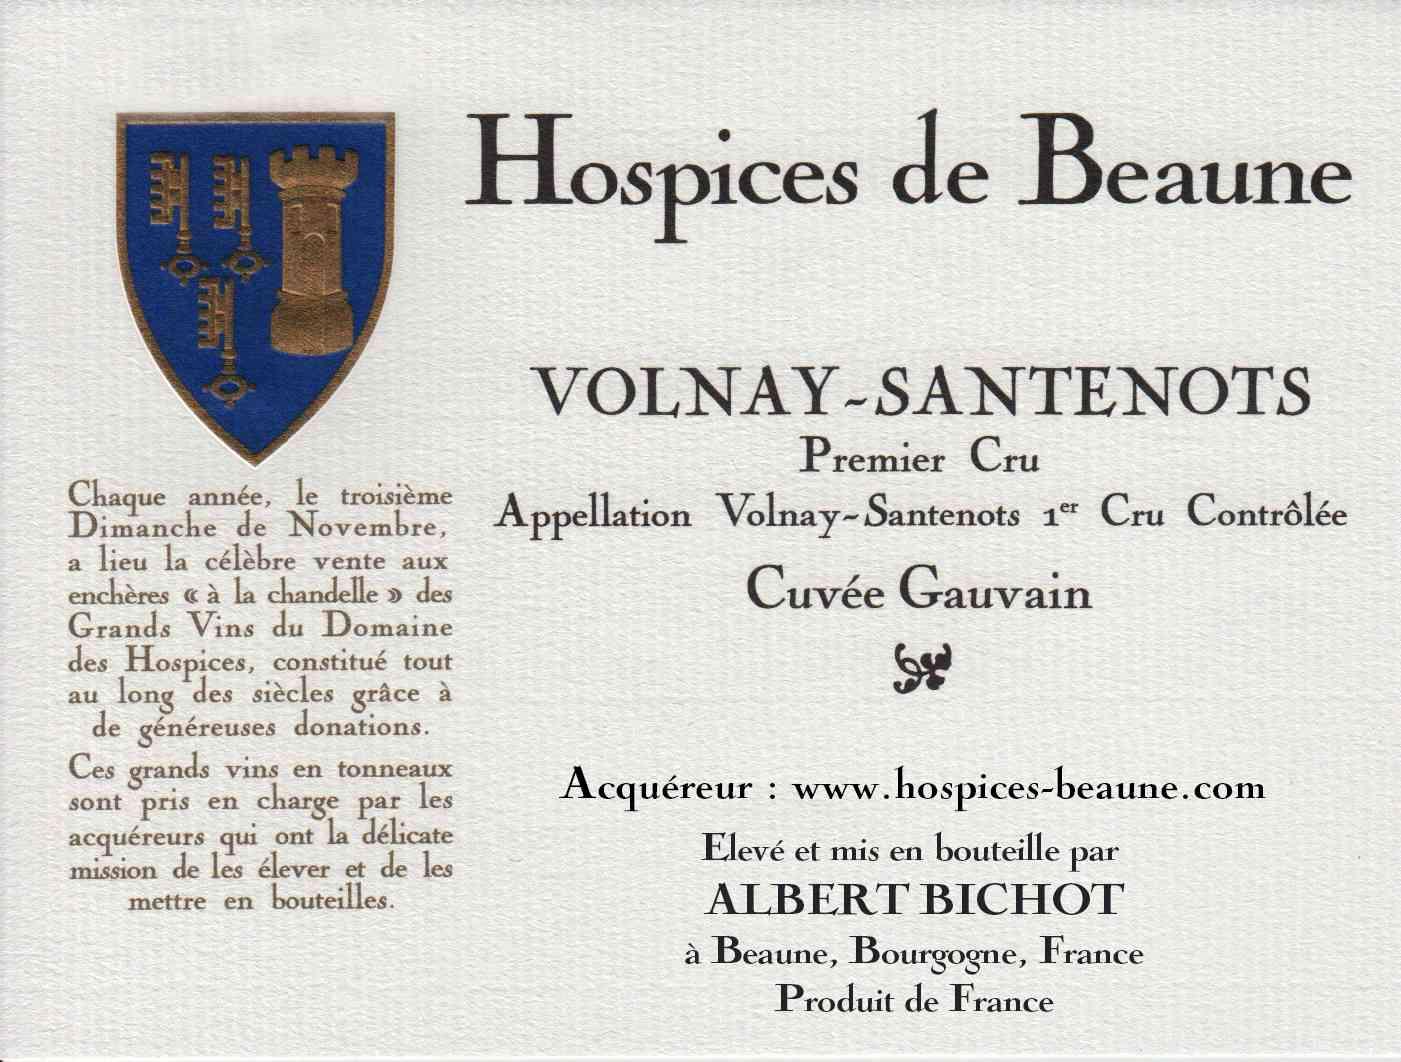 Encheres-auction-HospicesdeBeaune-AlbertBichot-VolnaySantenots-PremierCru-Cuvee-Gauvain